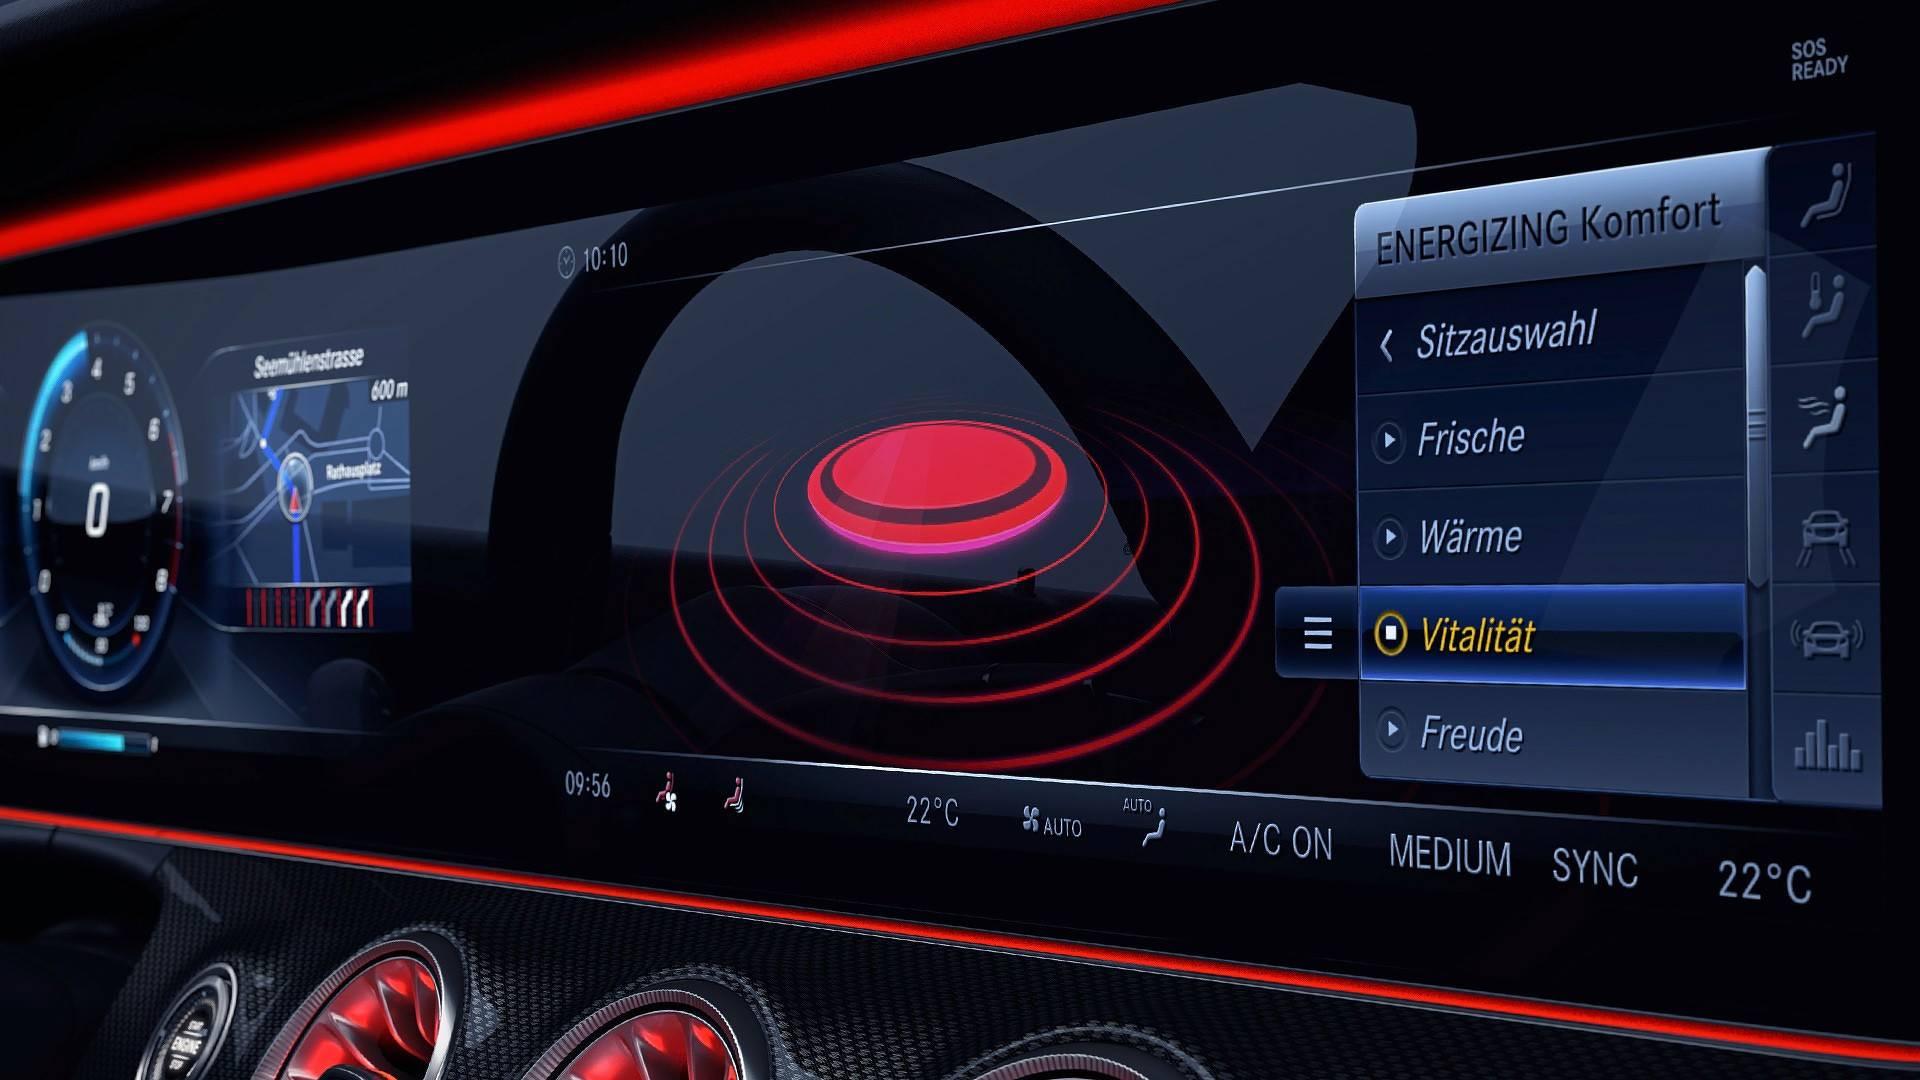 5a1ec784798e4 2018 mercedes cls teaser مرسدس بنز AMG CLS 53 برای اولین با در دیترویت به عنوان ۴۲۹ HP ترکیبی   اجاره ماشین